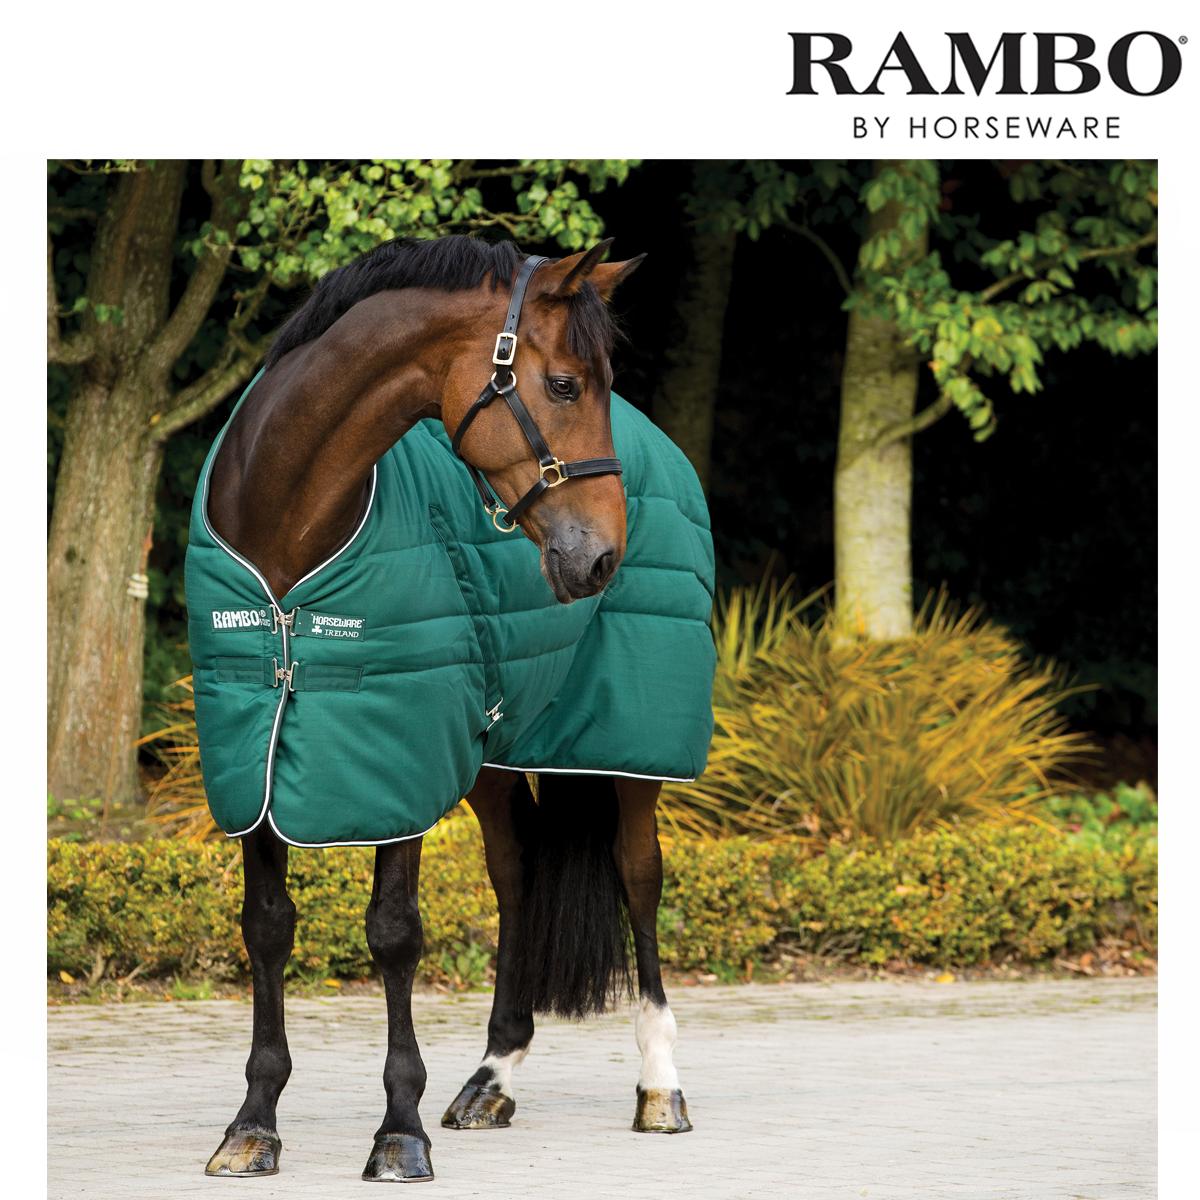 Horseware Rambo Heavyweight Stable Rug (Hunter Grün/Hunter Grün/Weiß) FREE